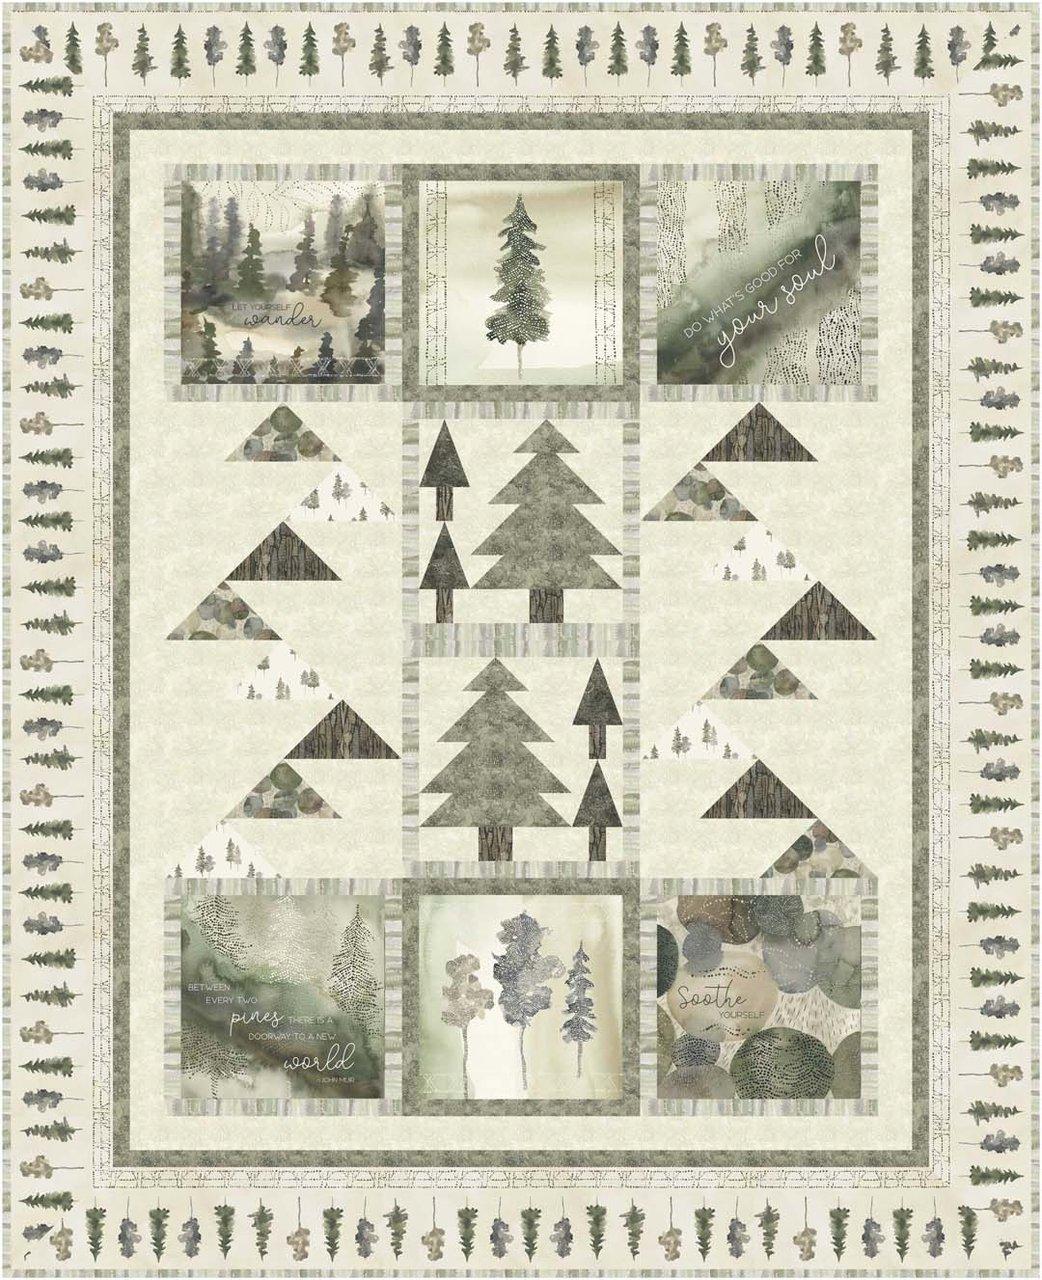 Forest Retreat 60x74 Quilt Kit